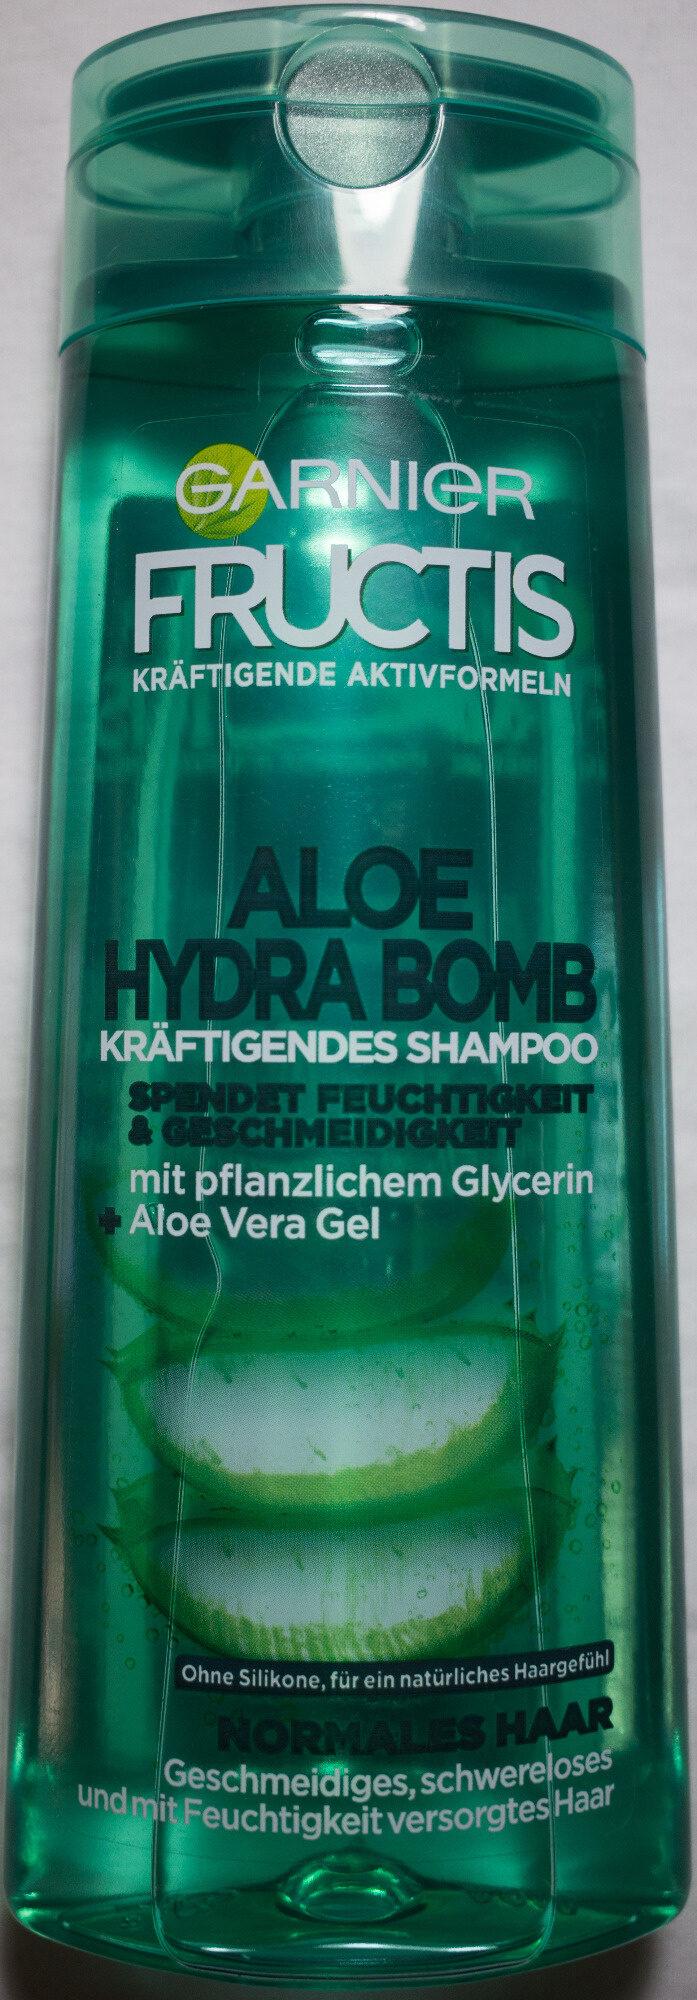 Aloe Hydro Bomb Kräftigendes Shampoo - Product - de